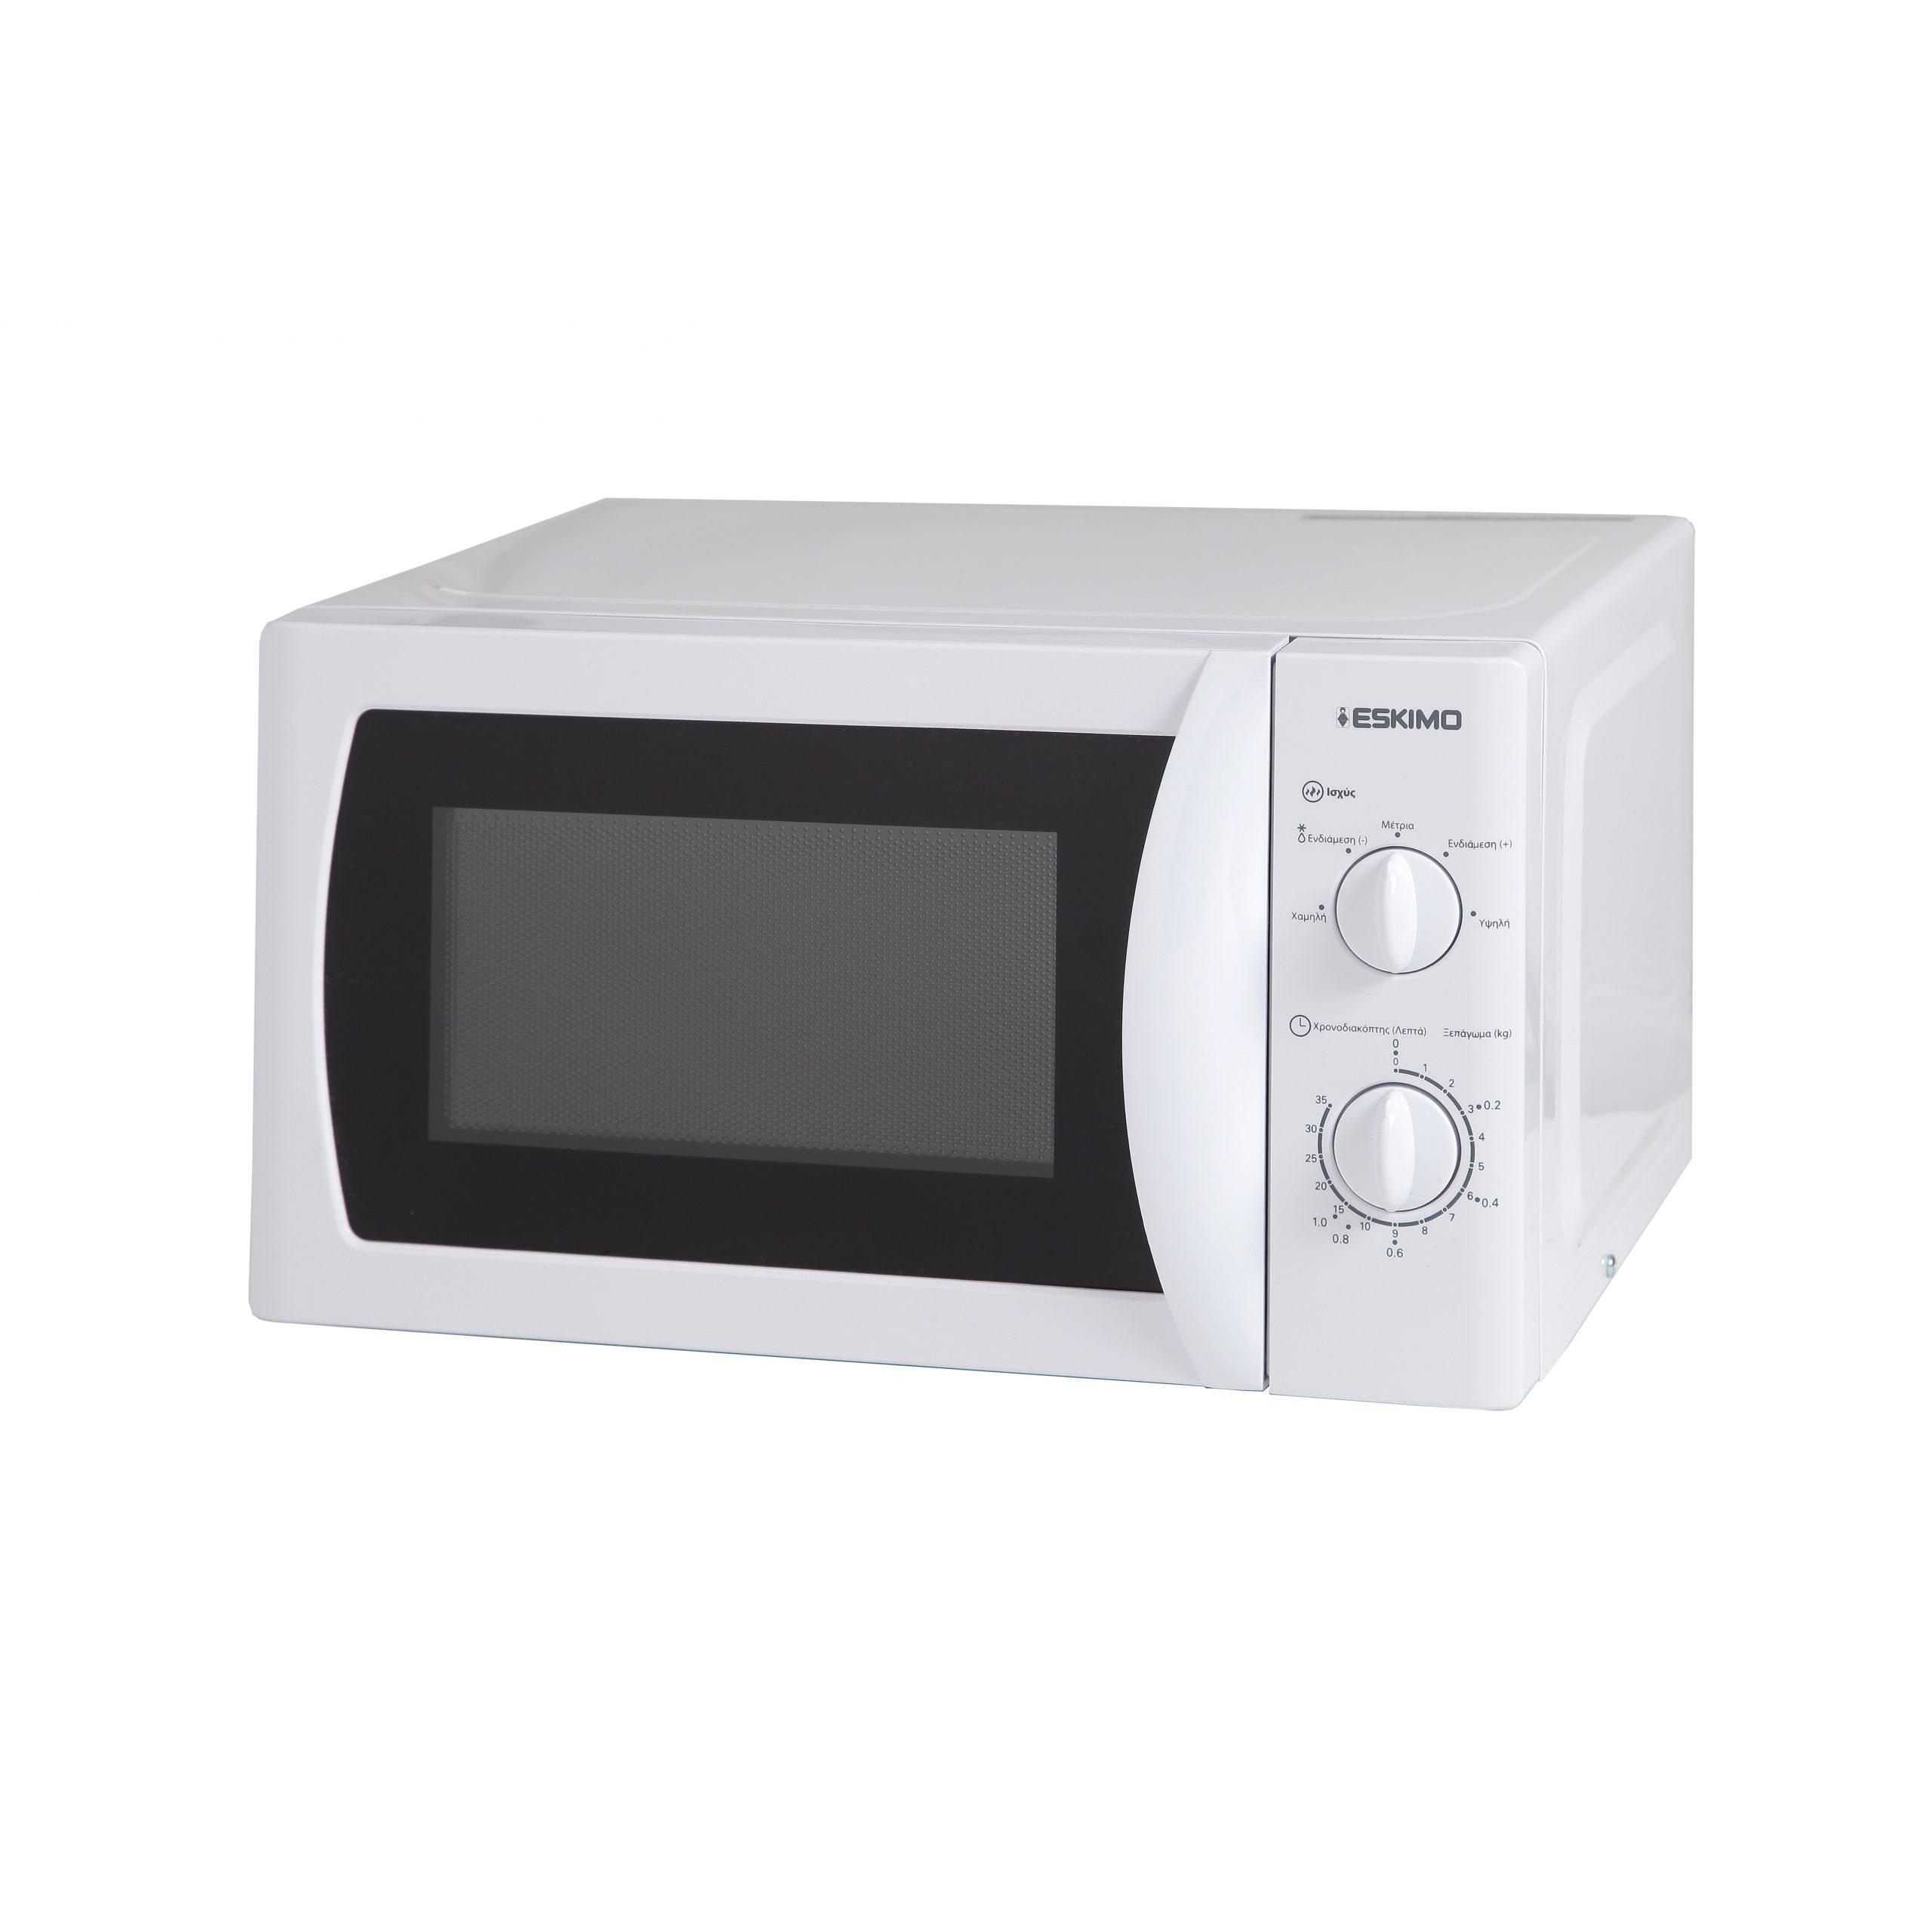 Eskimo Φούρνος Μικροκυμάτων ES 2070 W